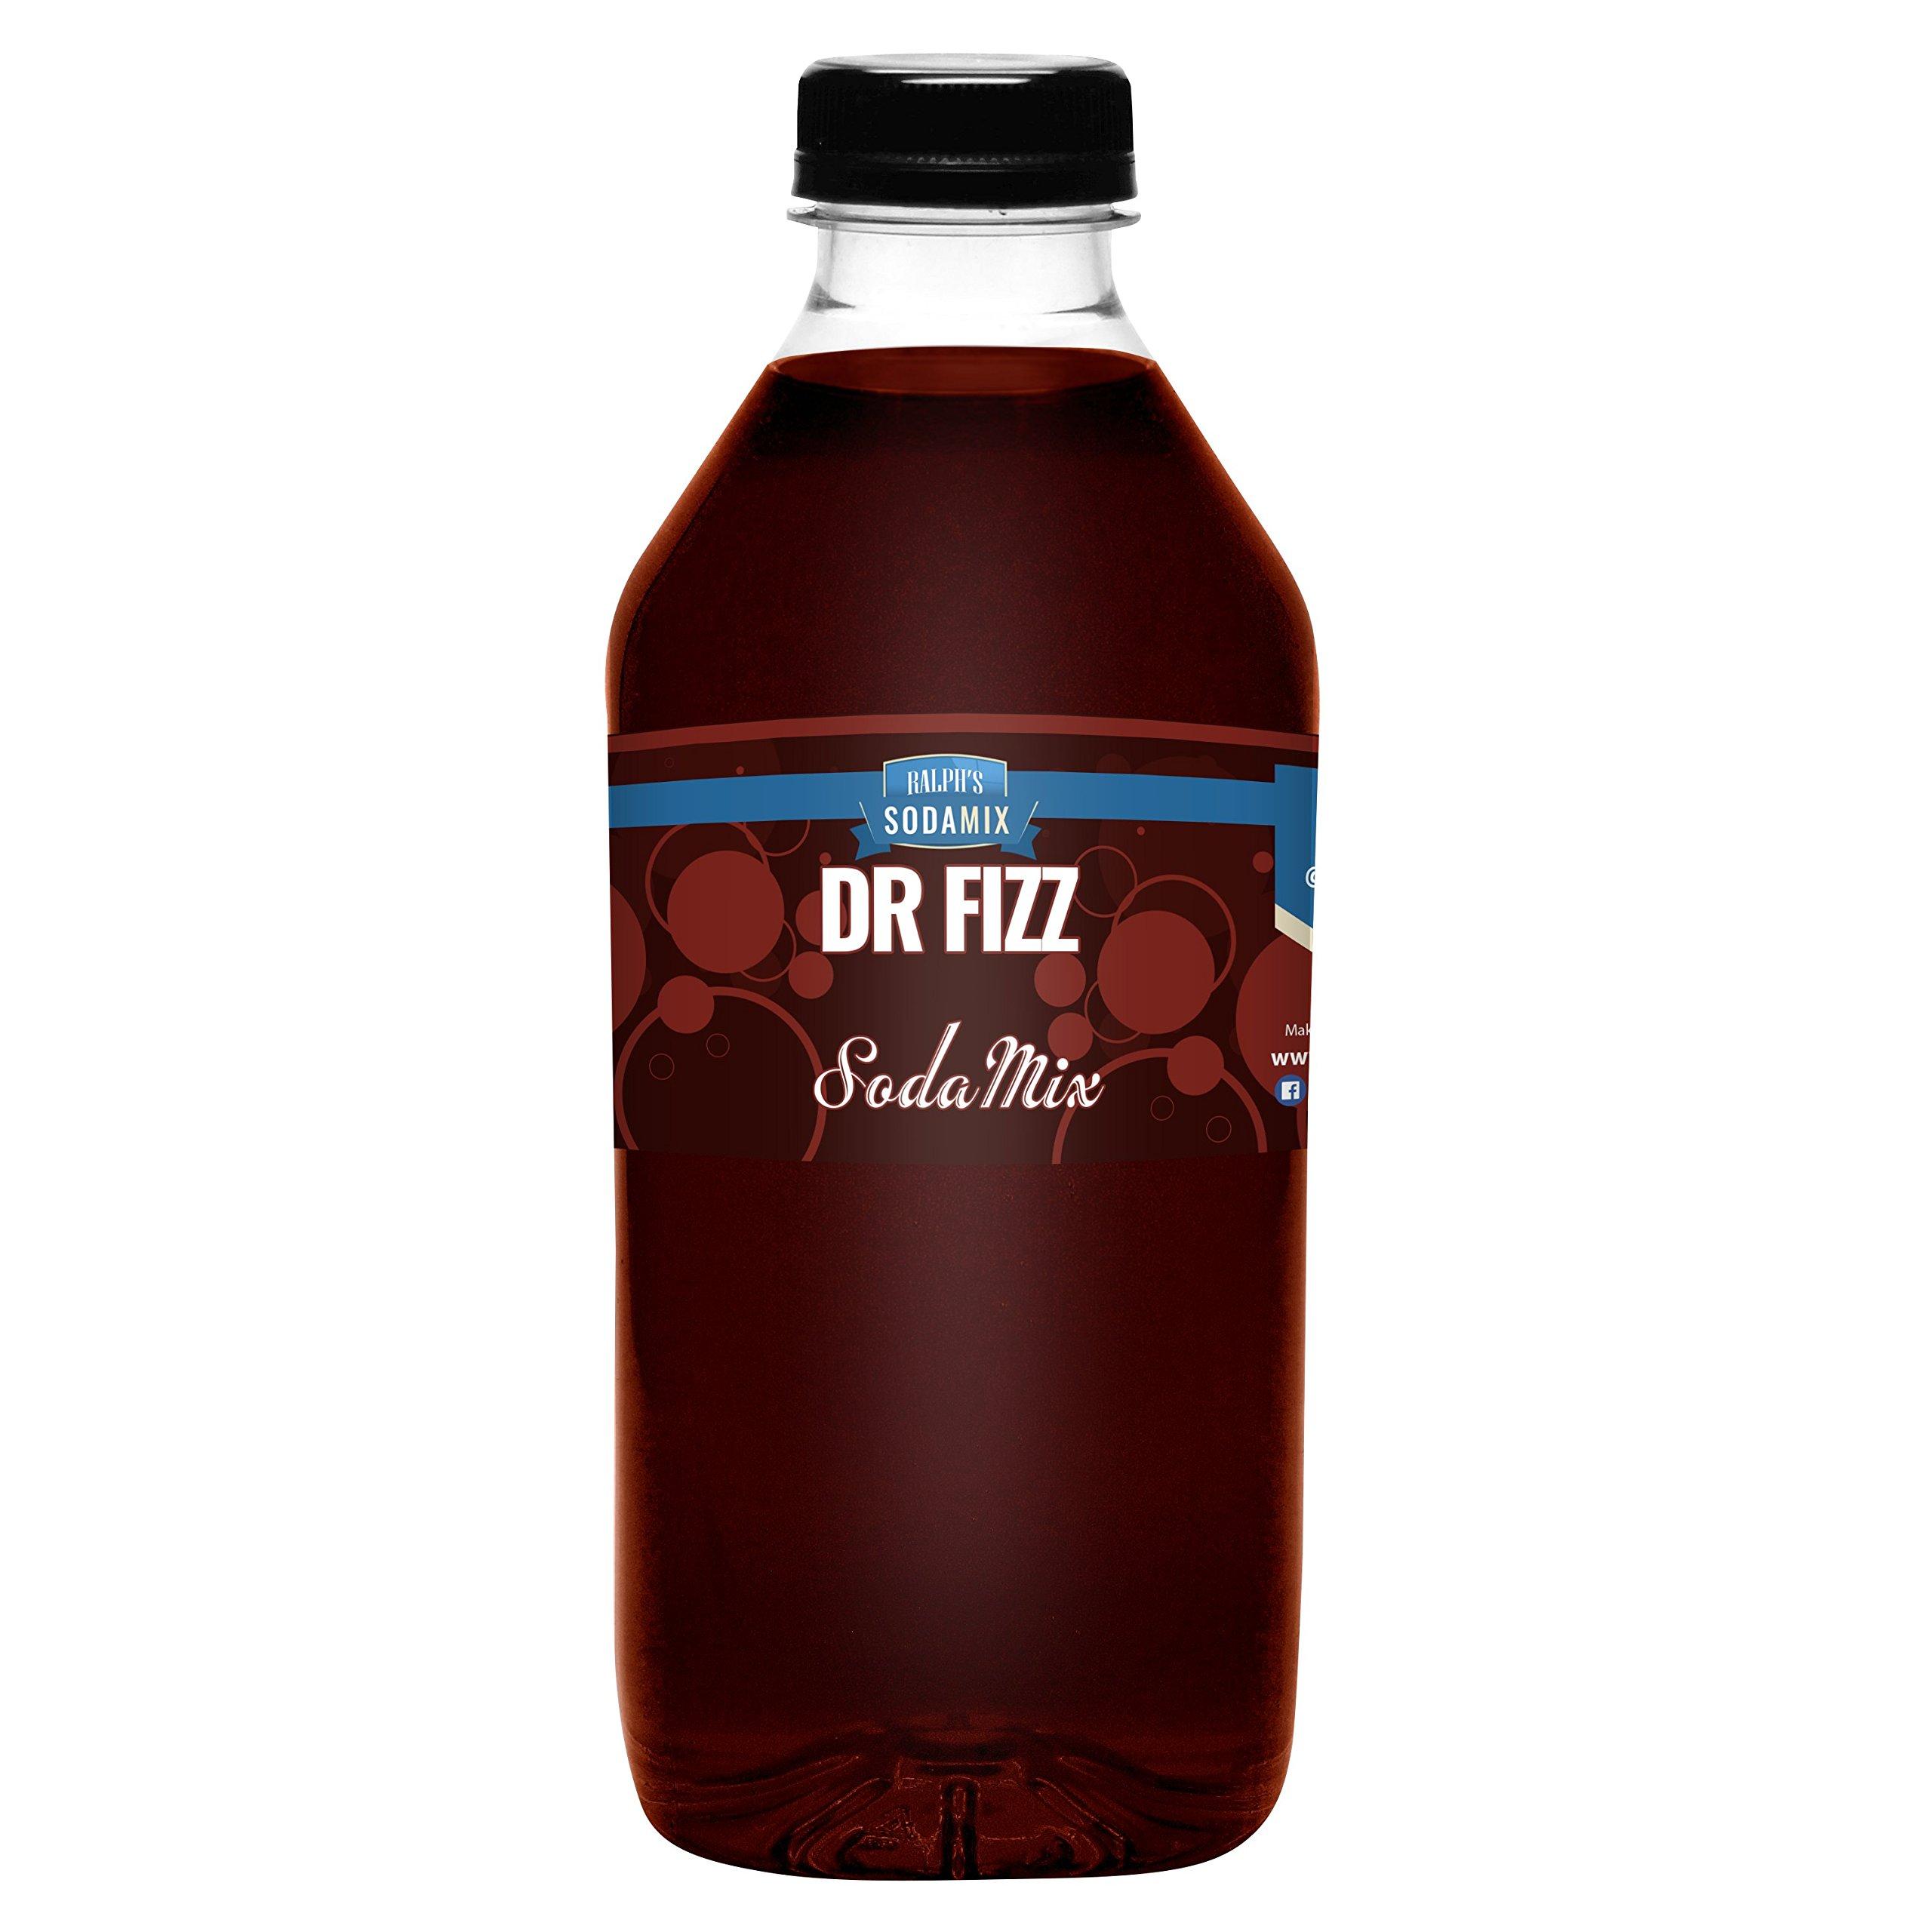 Ralph's Dr Fizz Sodamix for Sodastream | 32oz (Quart) Bottle